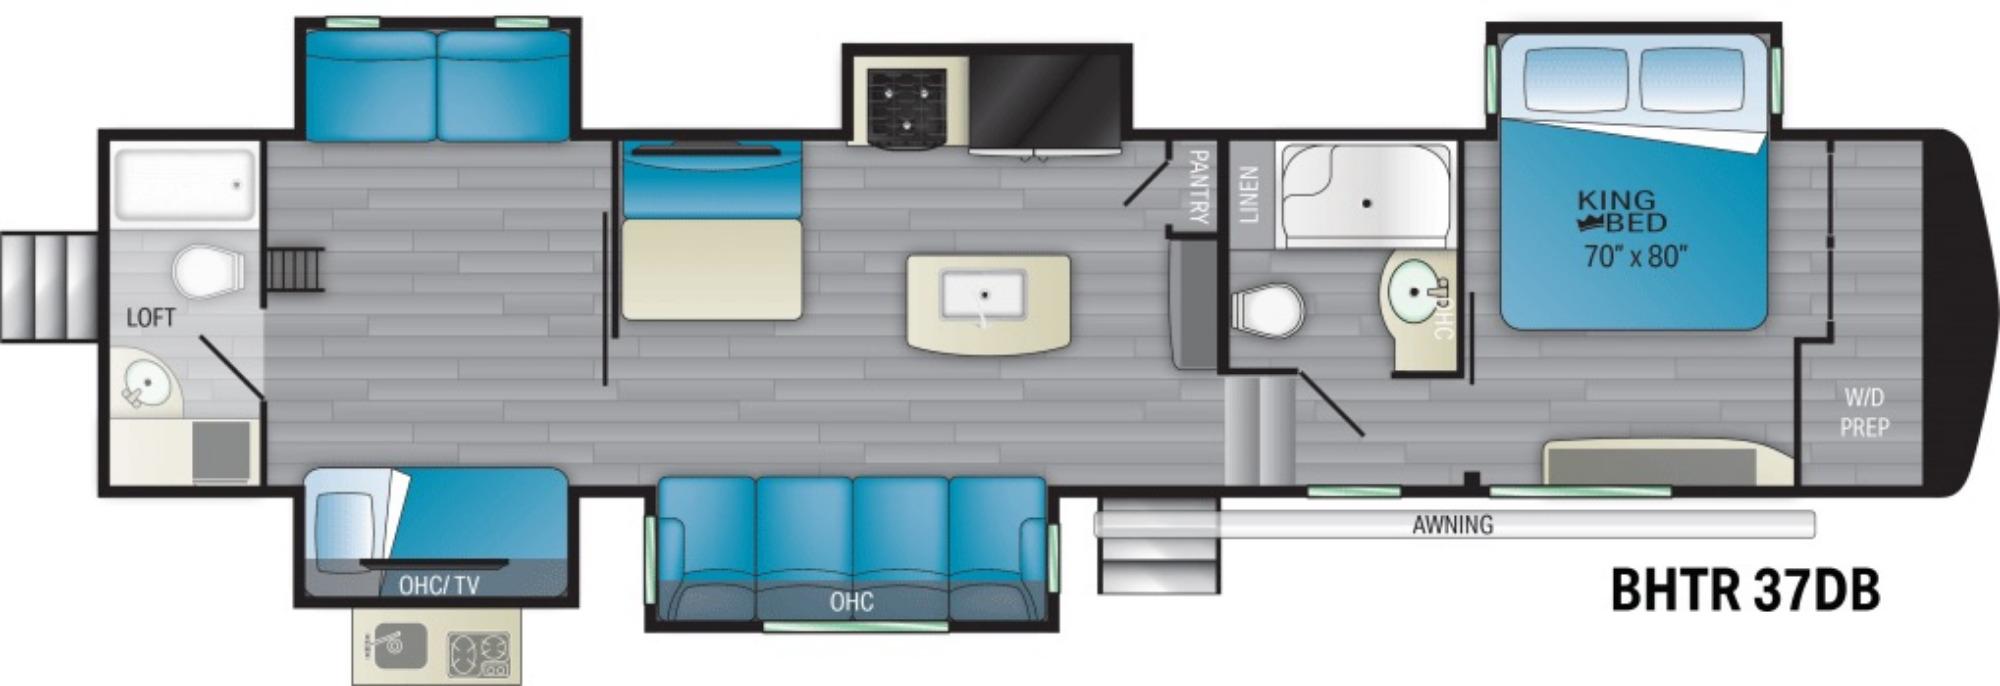 View Floor Plan for 2021 HEARTLAND BIGHORN TRAVELER 37DB